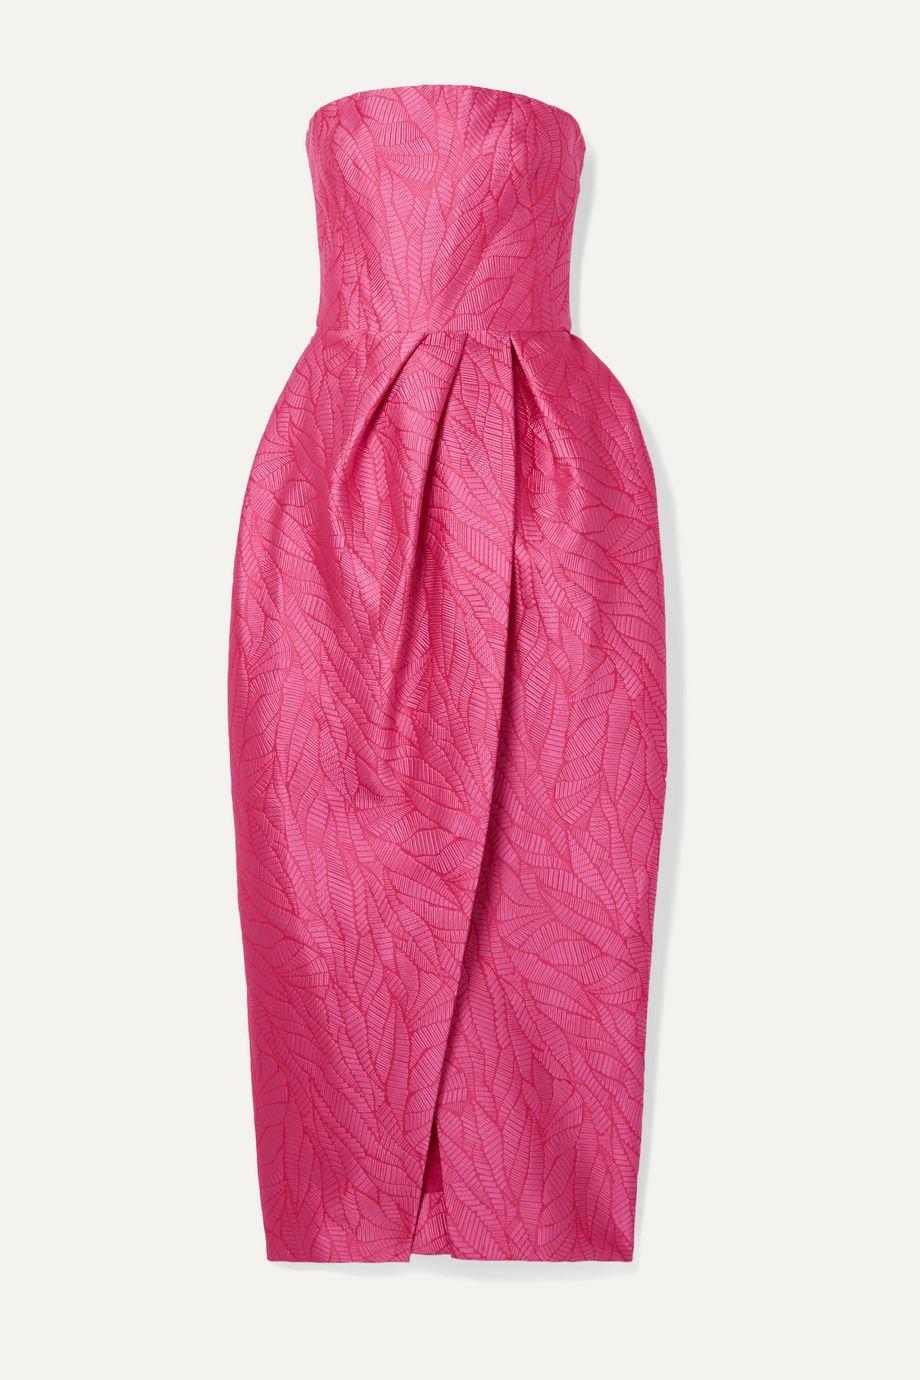 Monique Lhuillier Strapless jacquard midi dress